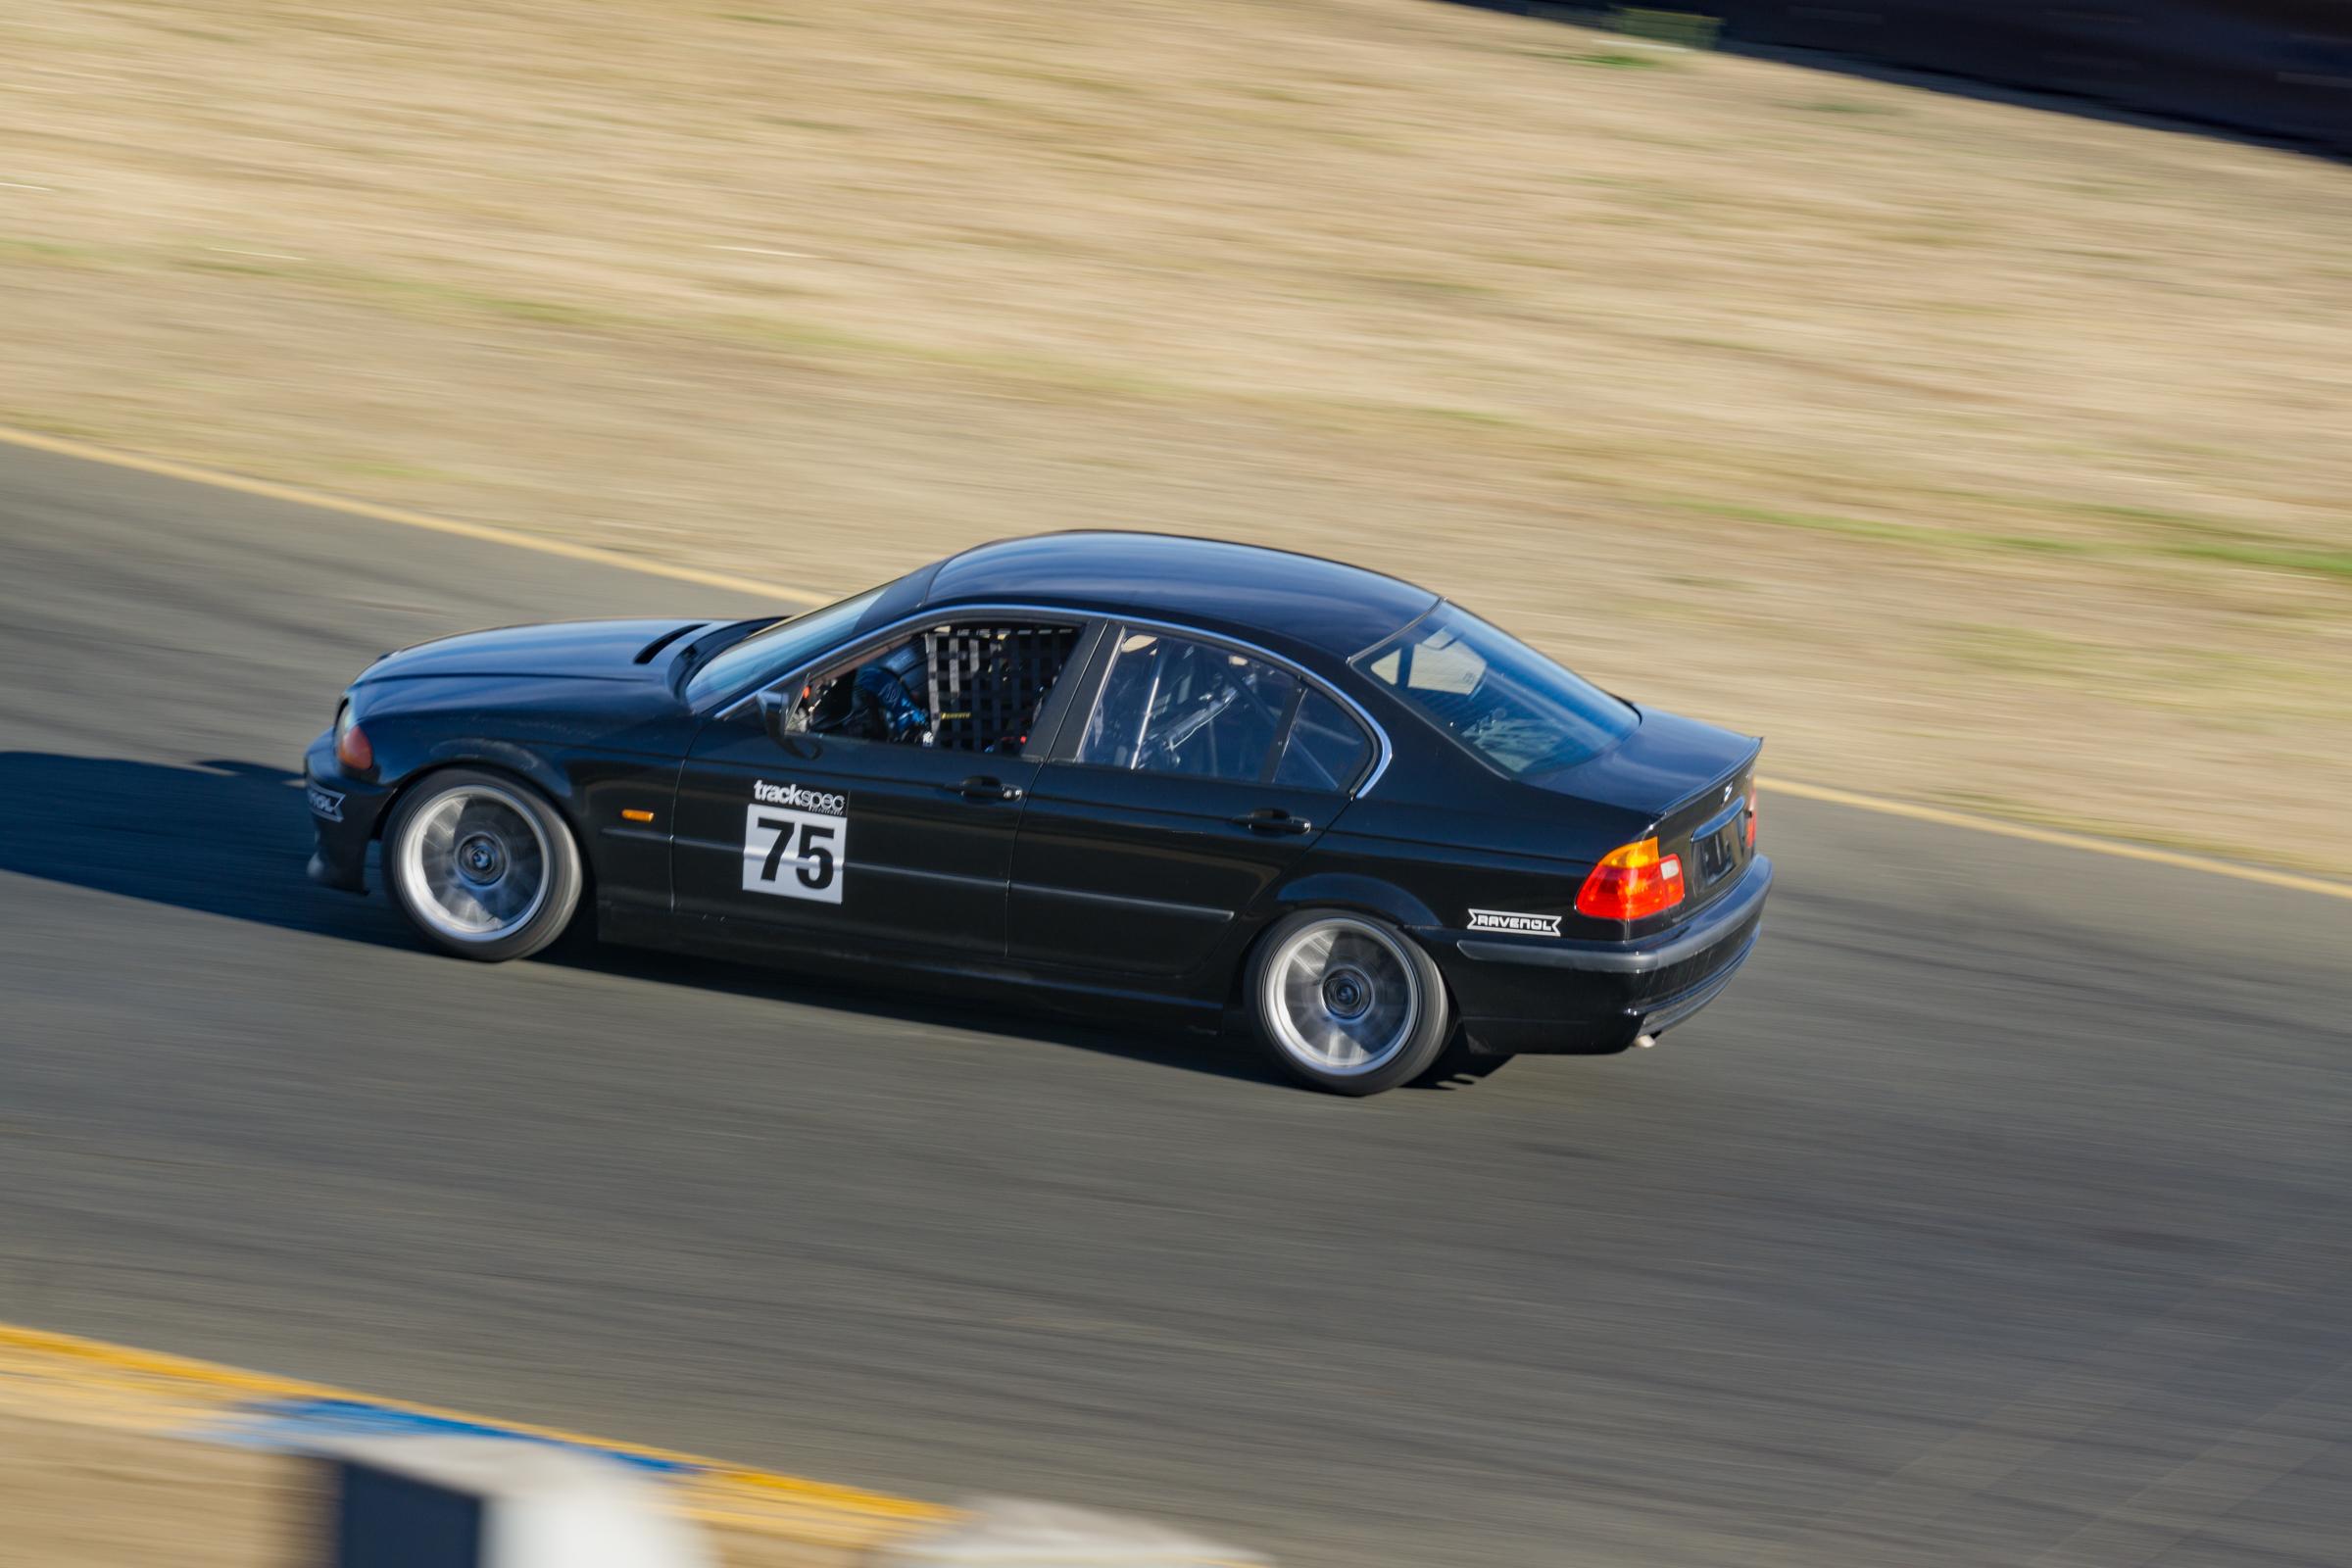 Jonathan Vo Trackspec Autosports BMW E46 330